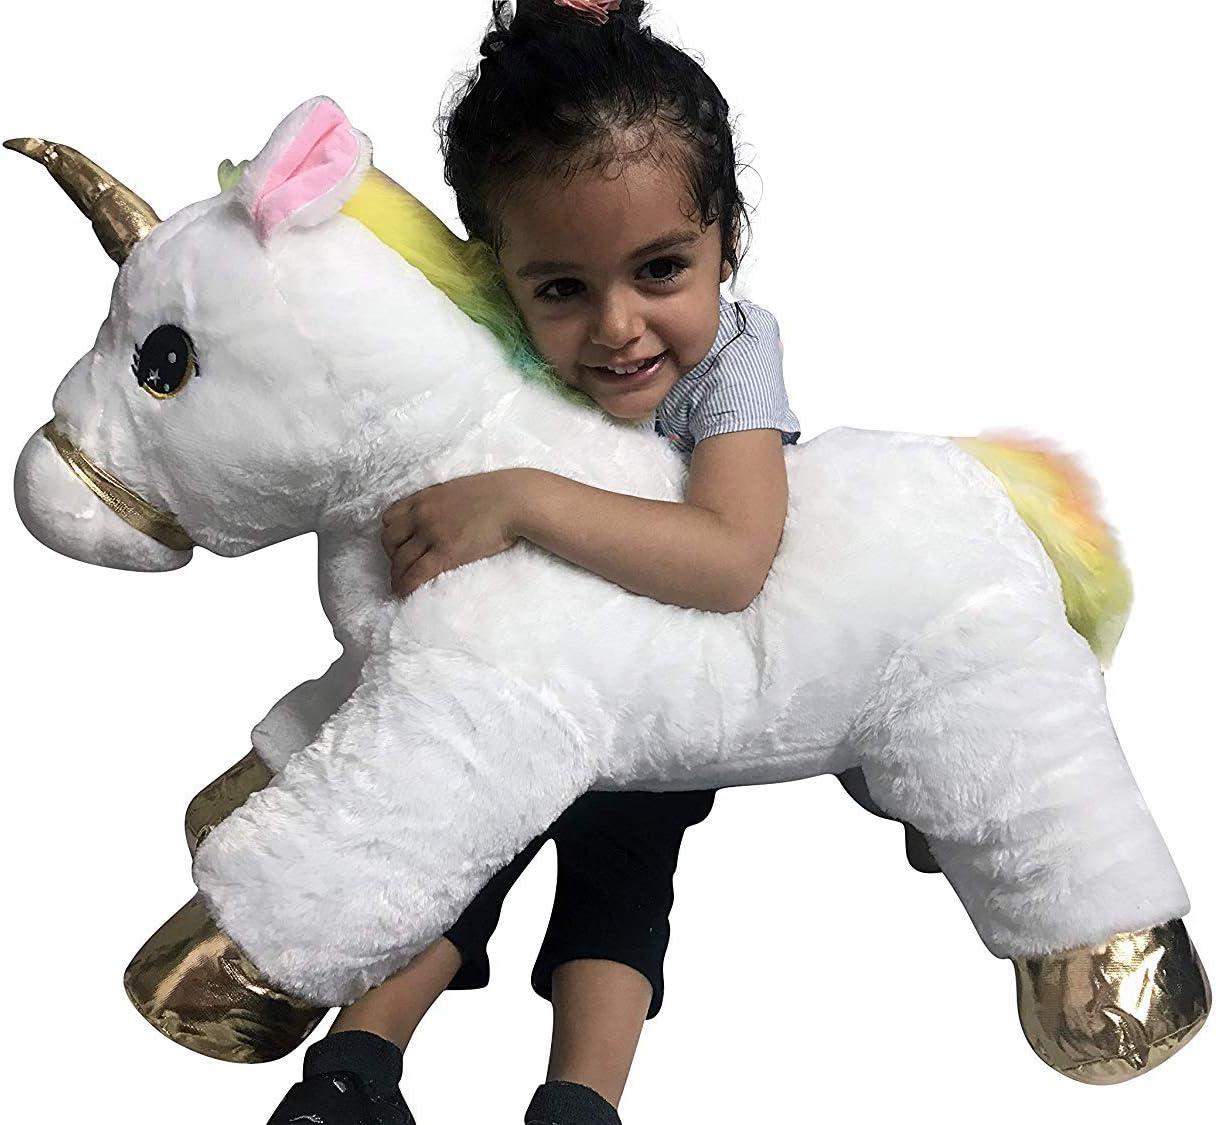 Gold GRIFIL ZERO XXL Size Unicorn Stuffed Animal Pillow Plush Toy Kid Babies Nursery Room Decoration Huge Big Large Doll